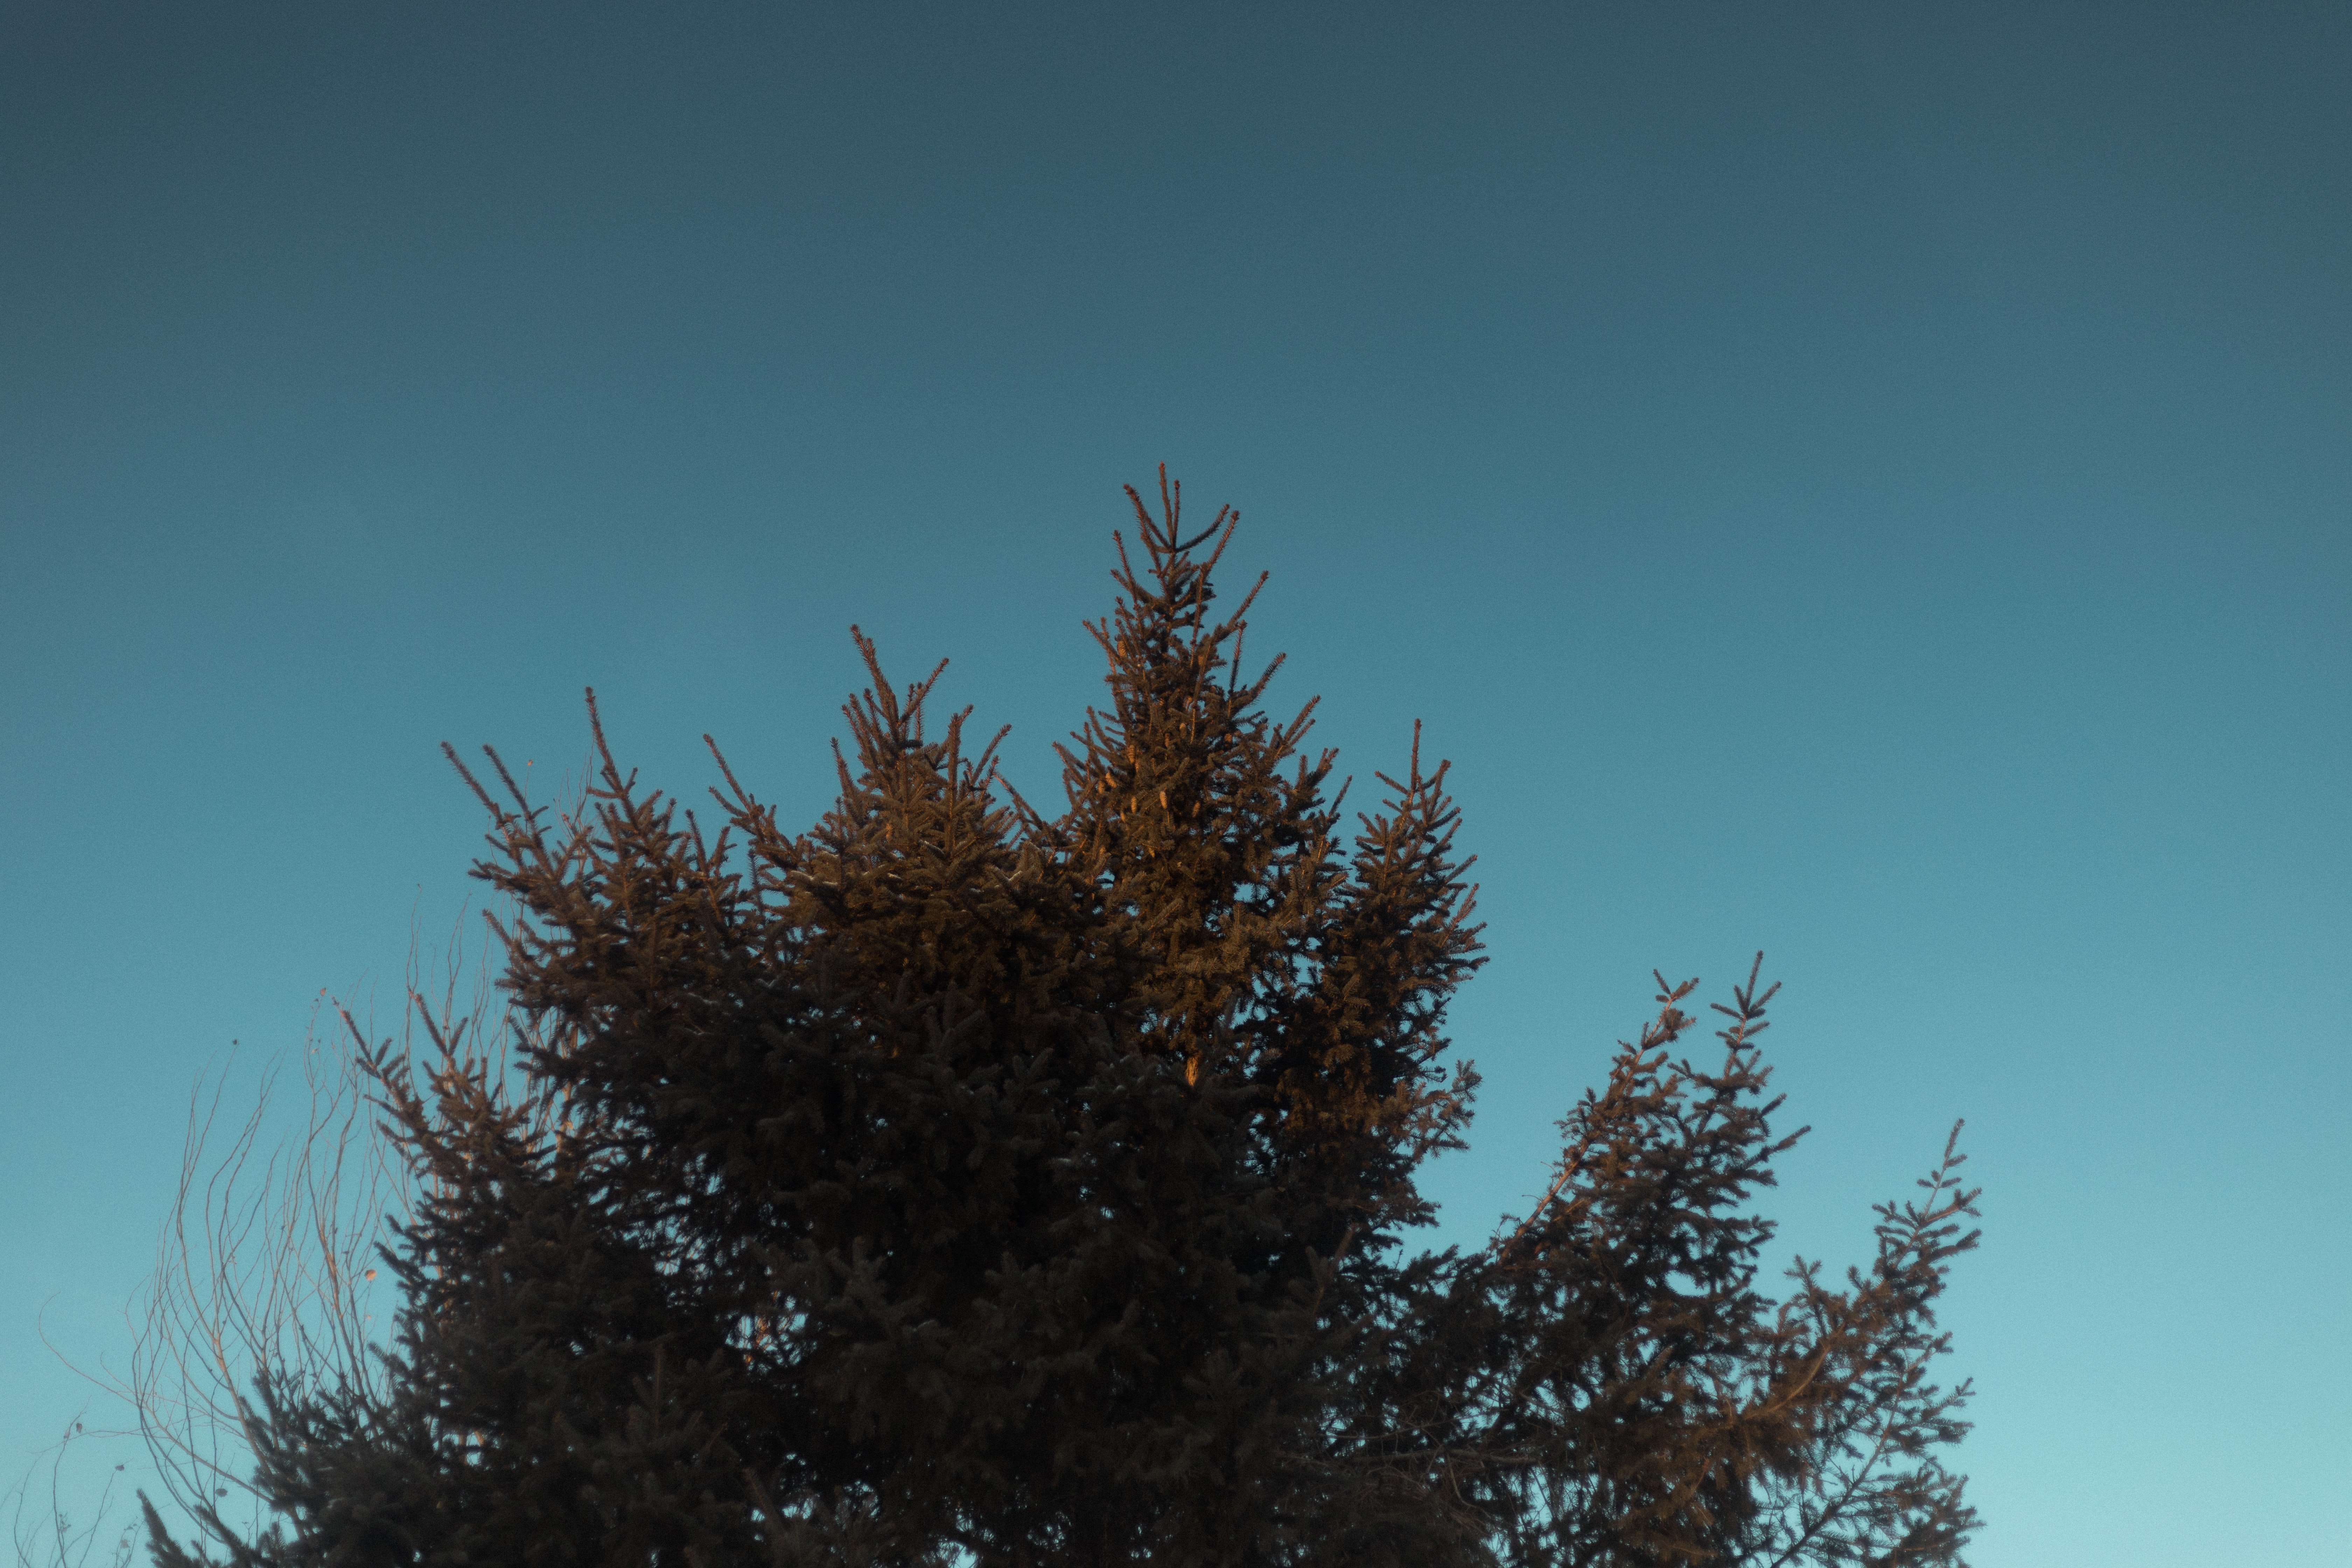 green leafed tree under blue sky